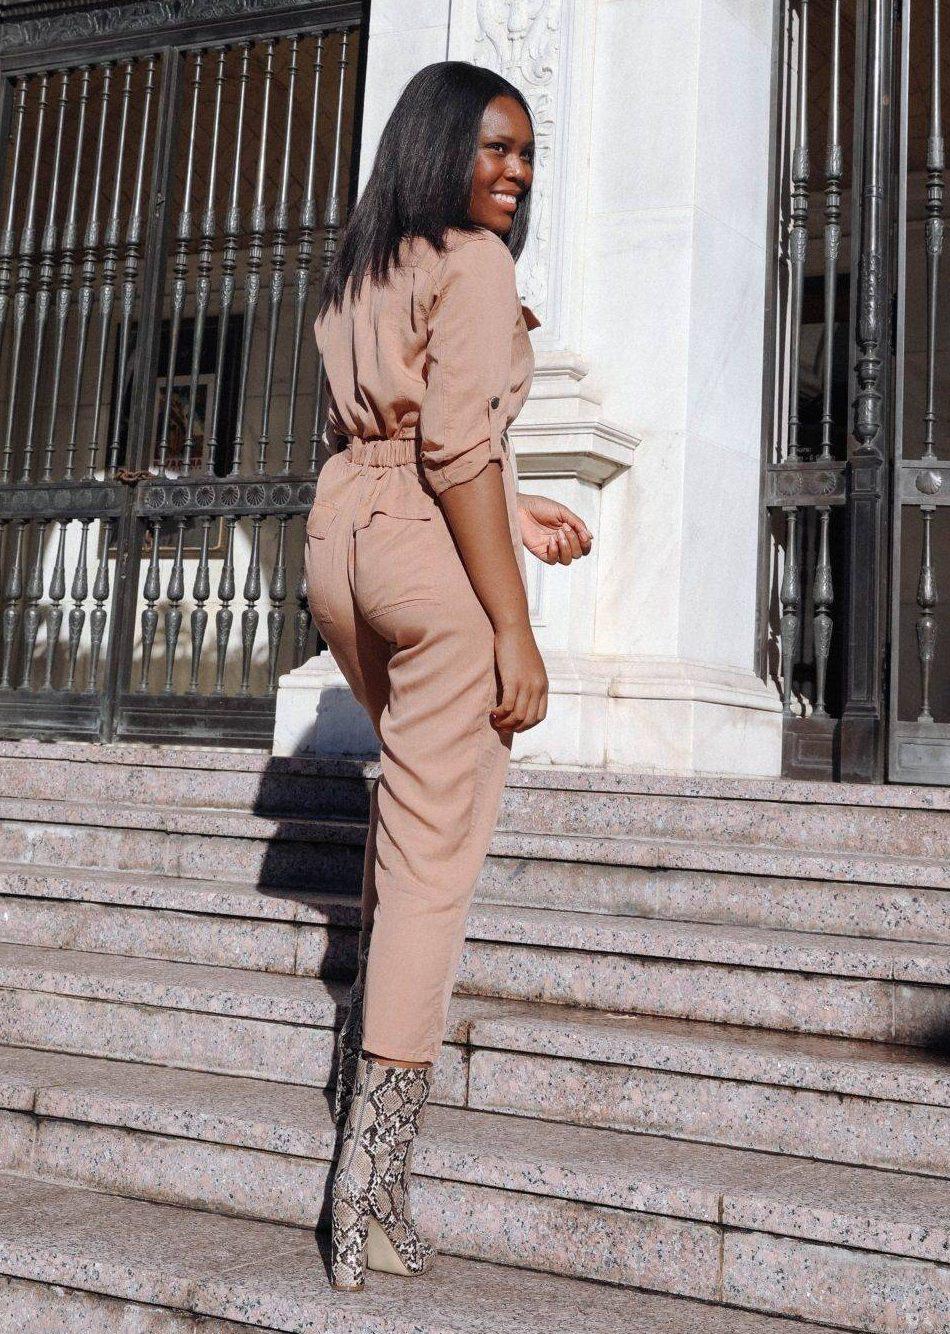 ways to wear Boiler Suit Trend 2020 - Le Fab Chic